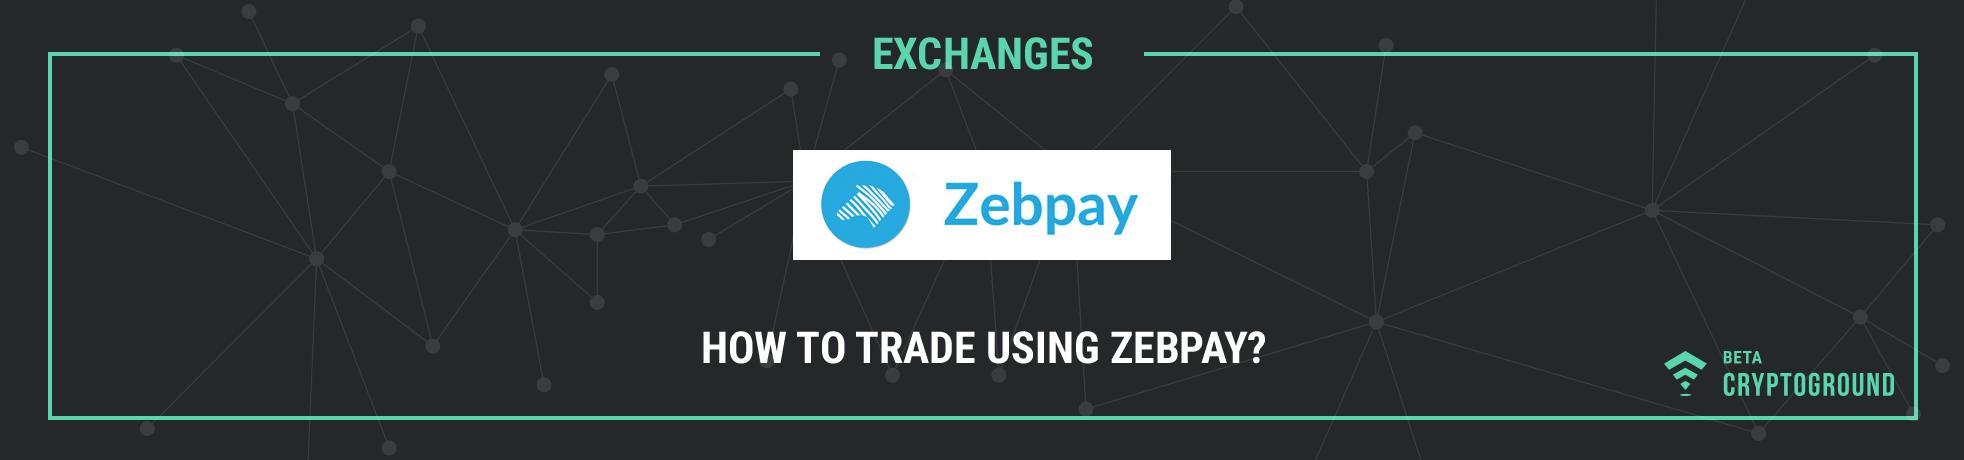 How to trade using Zebpay?